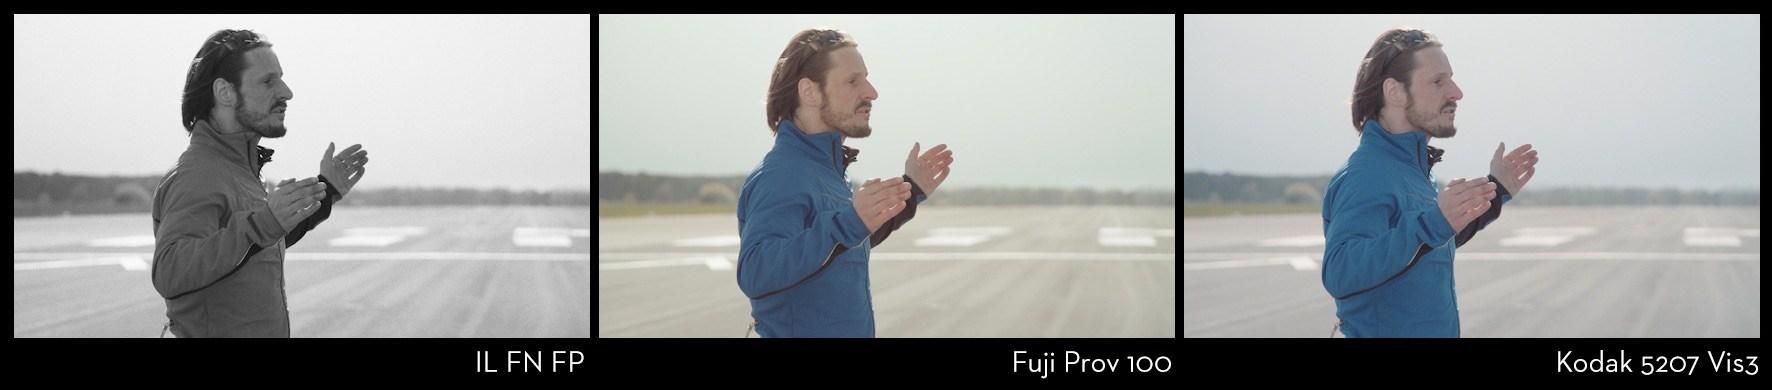 Creating a real film look with FilmConvert - Jonny Elwyn